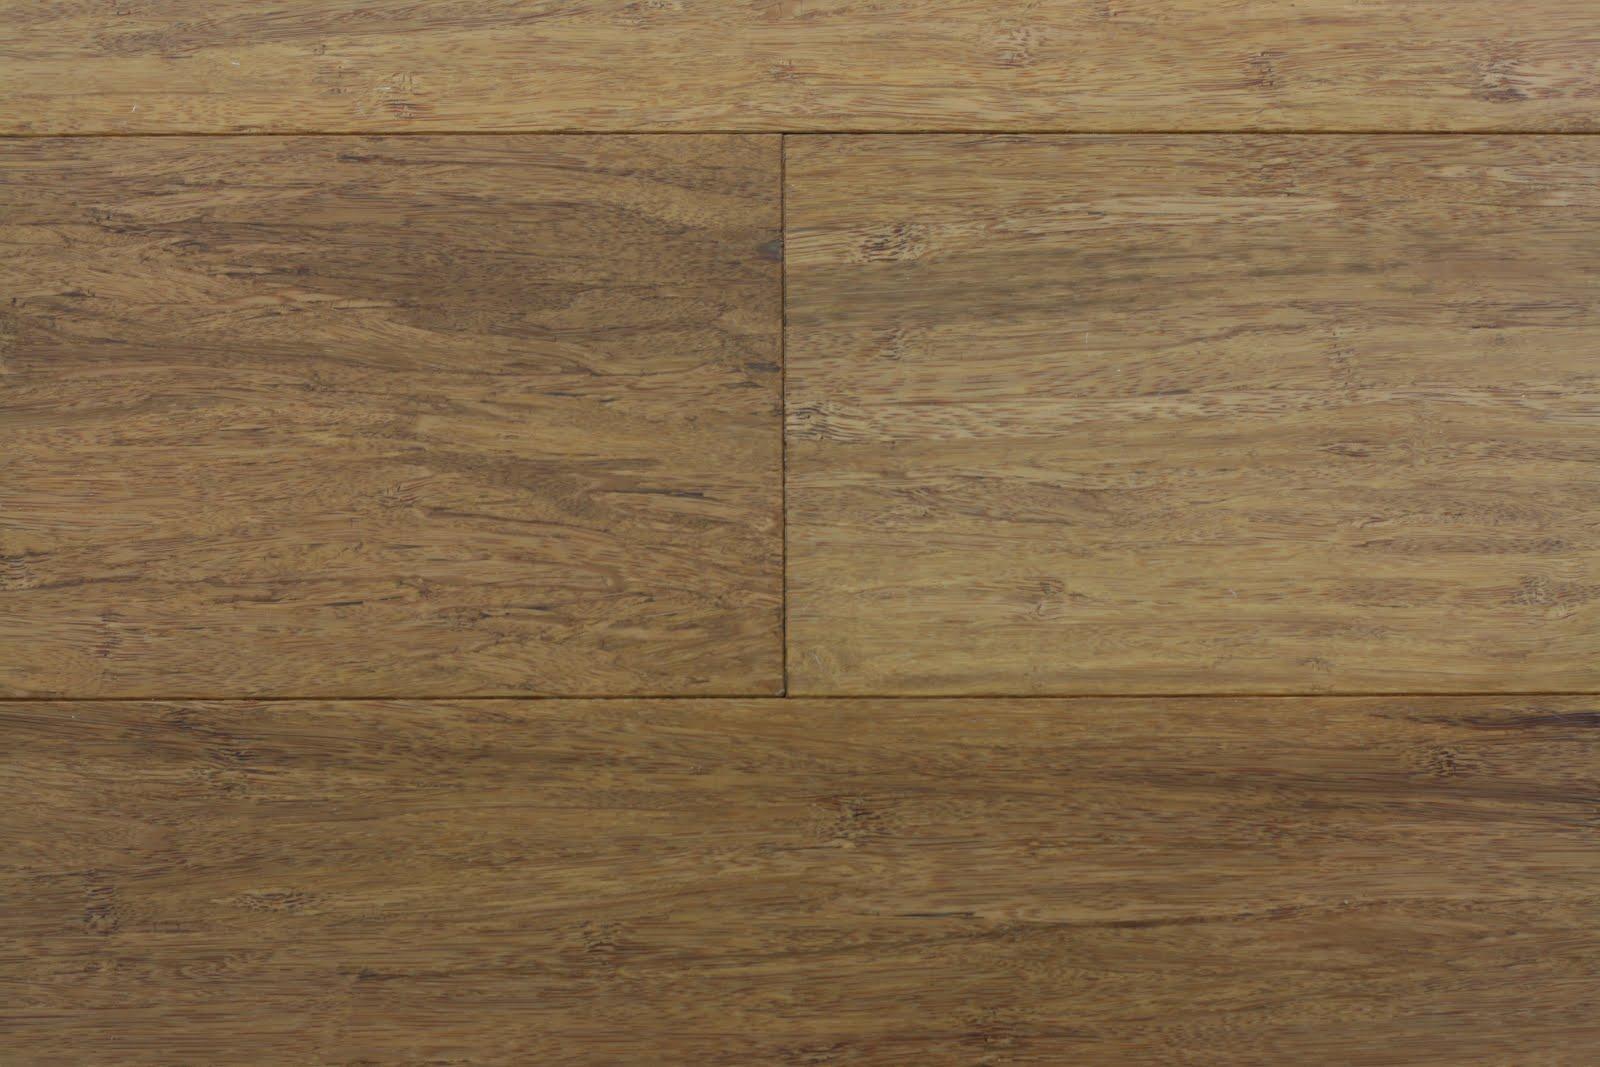 Woodmonsters Inc Hardwood Flooring Made Affordable